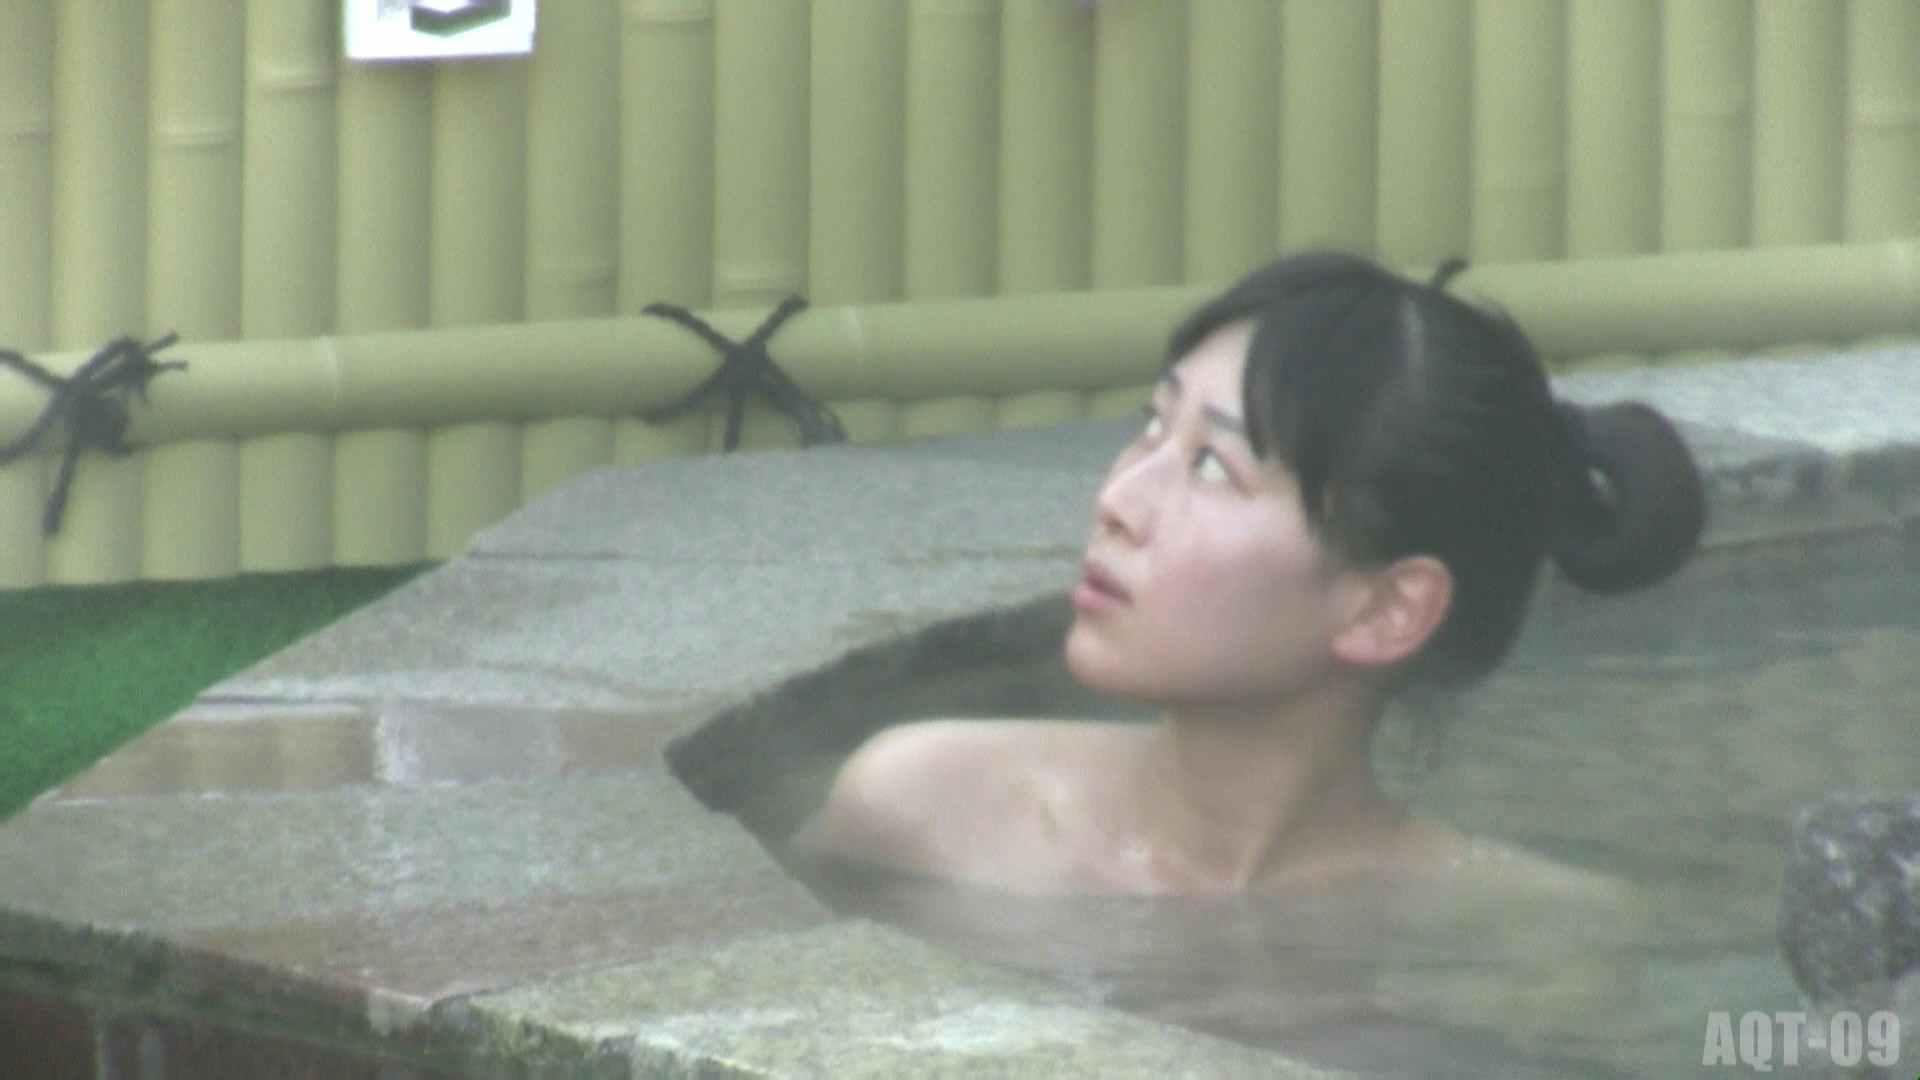 Aquaな露天風呂Vol.785 0  51連発 45